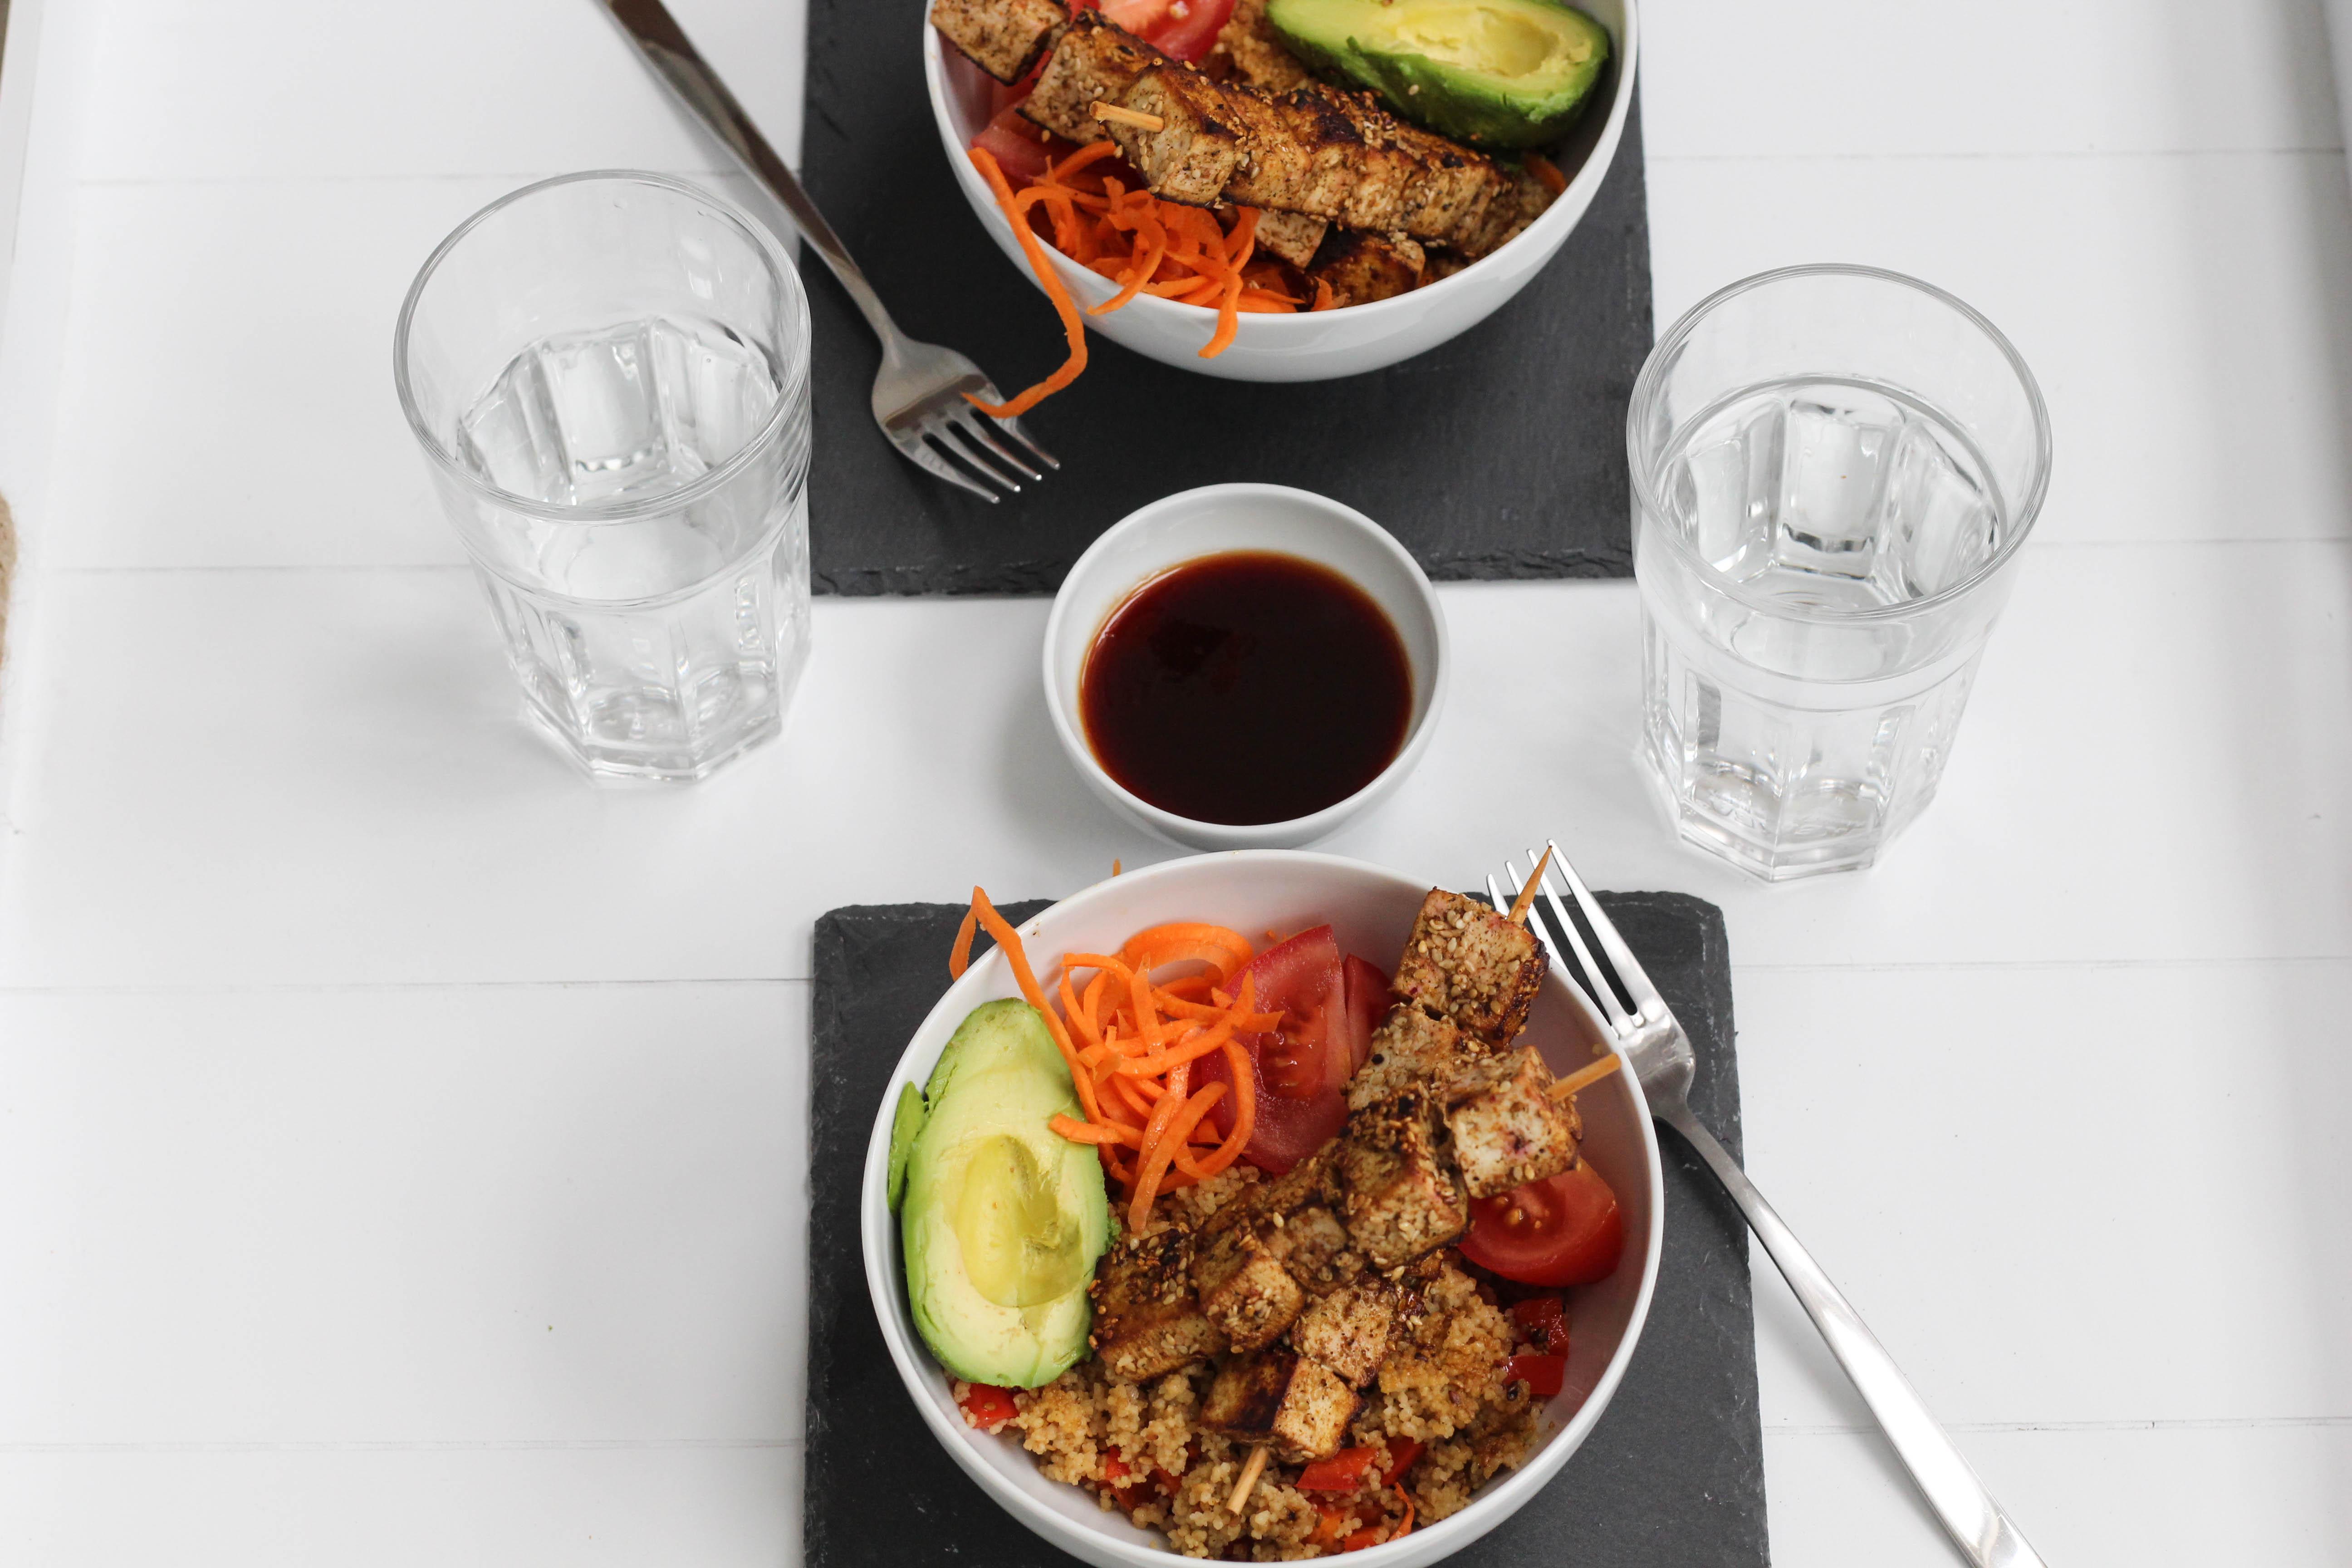 vegan-tofuspiesse-avocado-bowl-couscous-healthy-homespa-plantbased